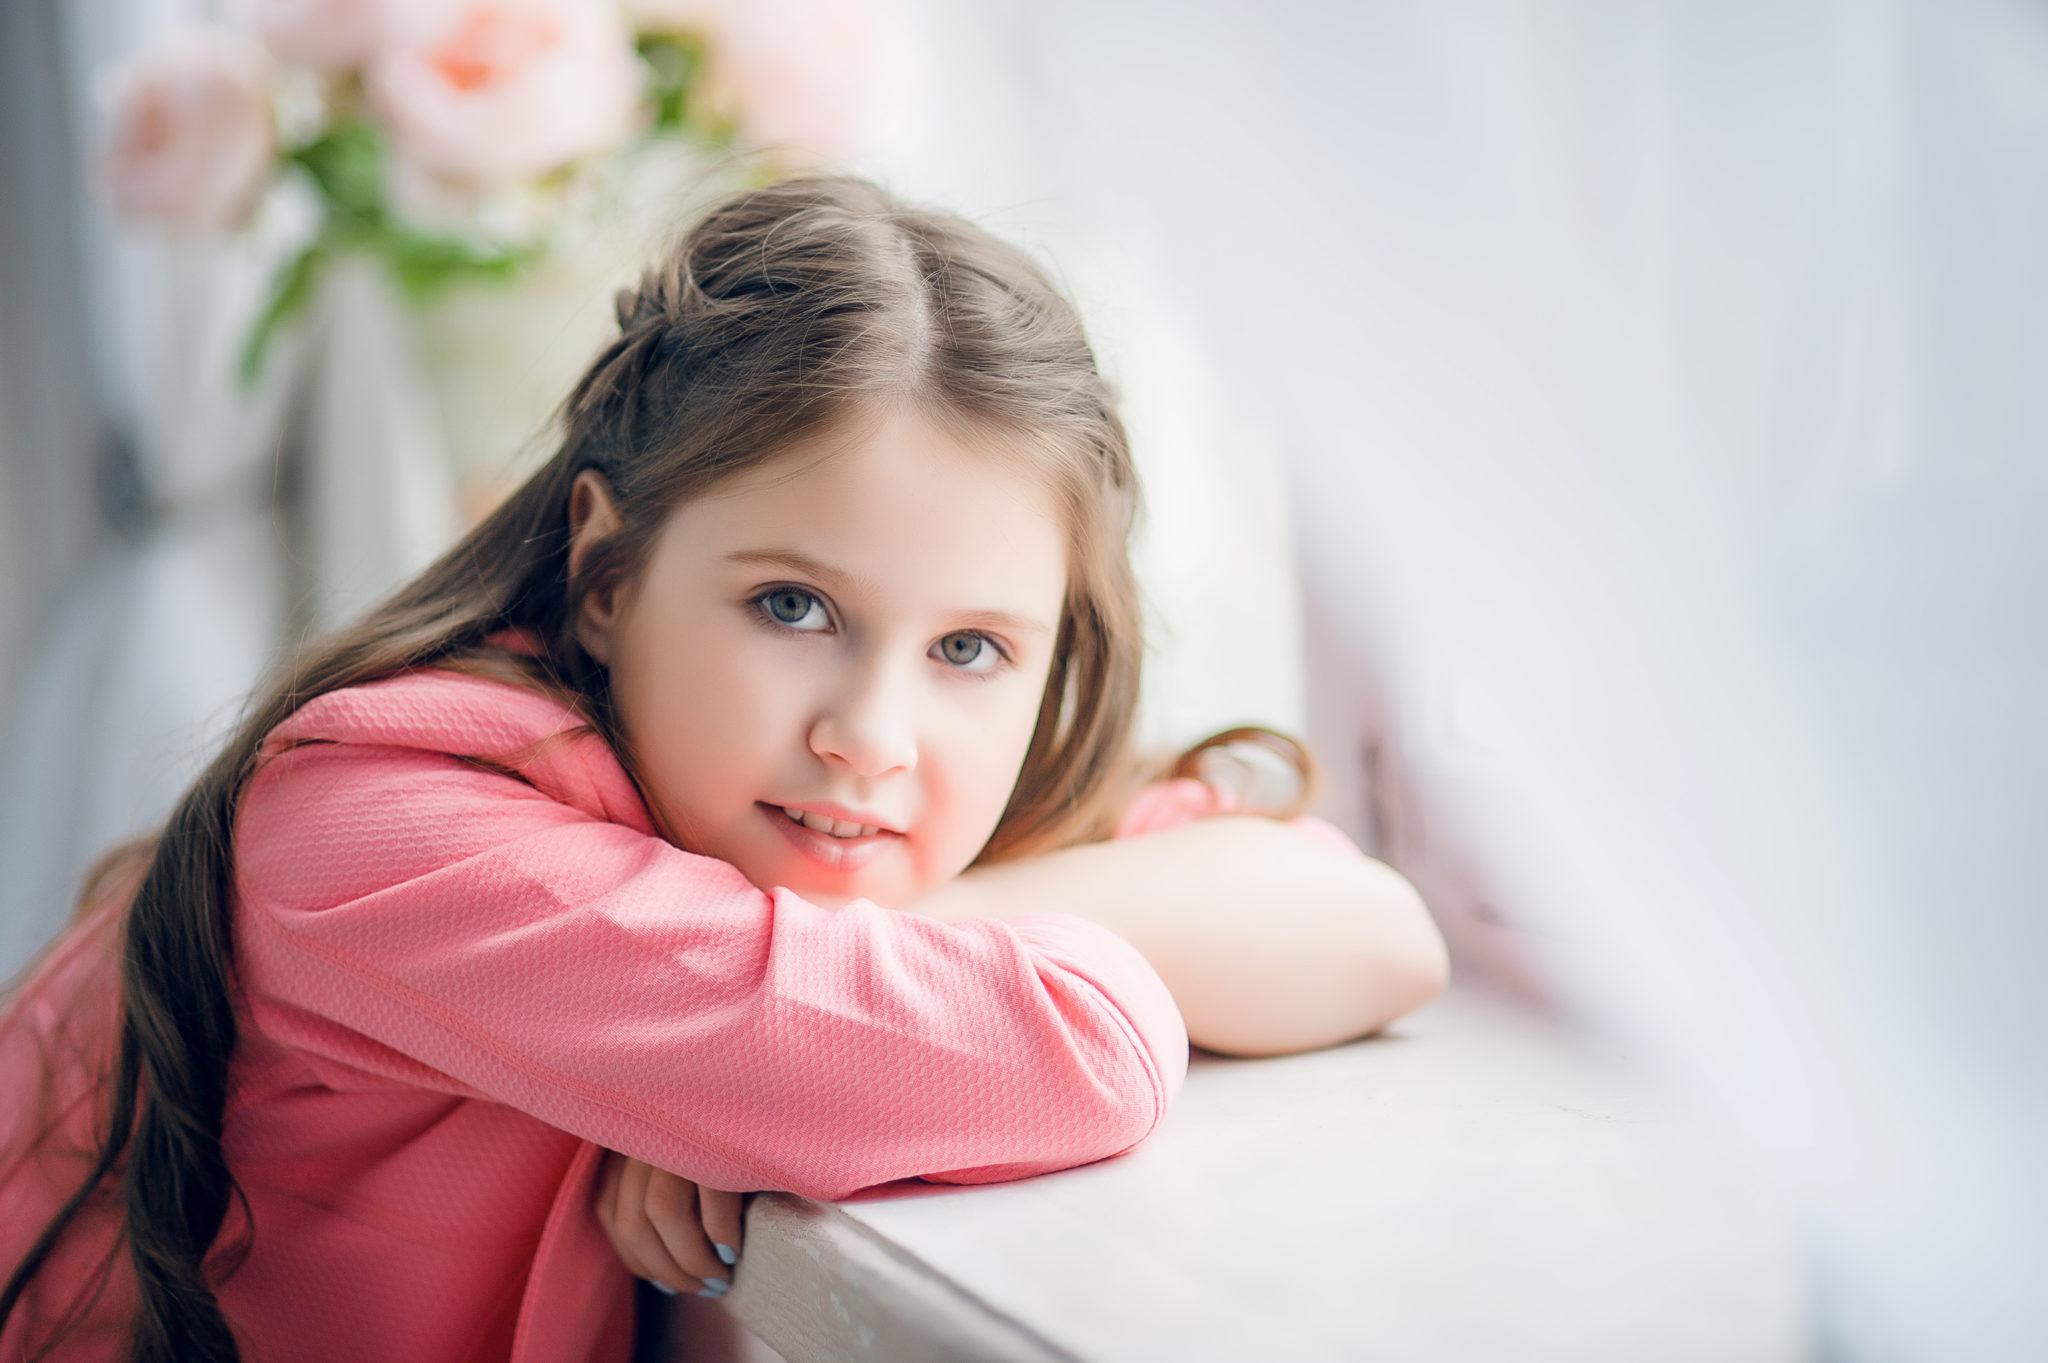 Детская фотосессия, девочка на фоне цветов на подоконнике